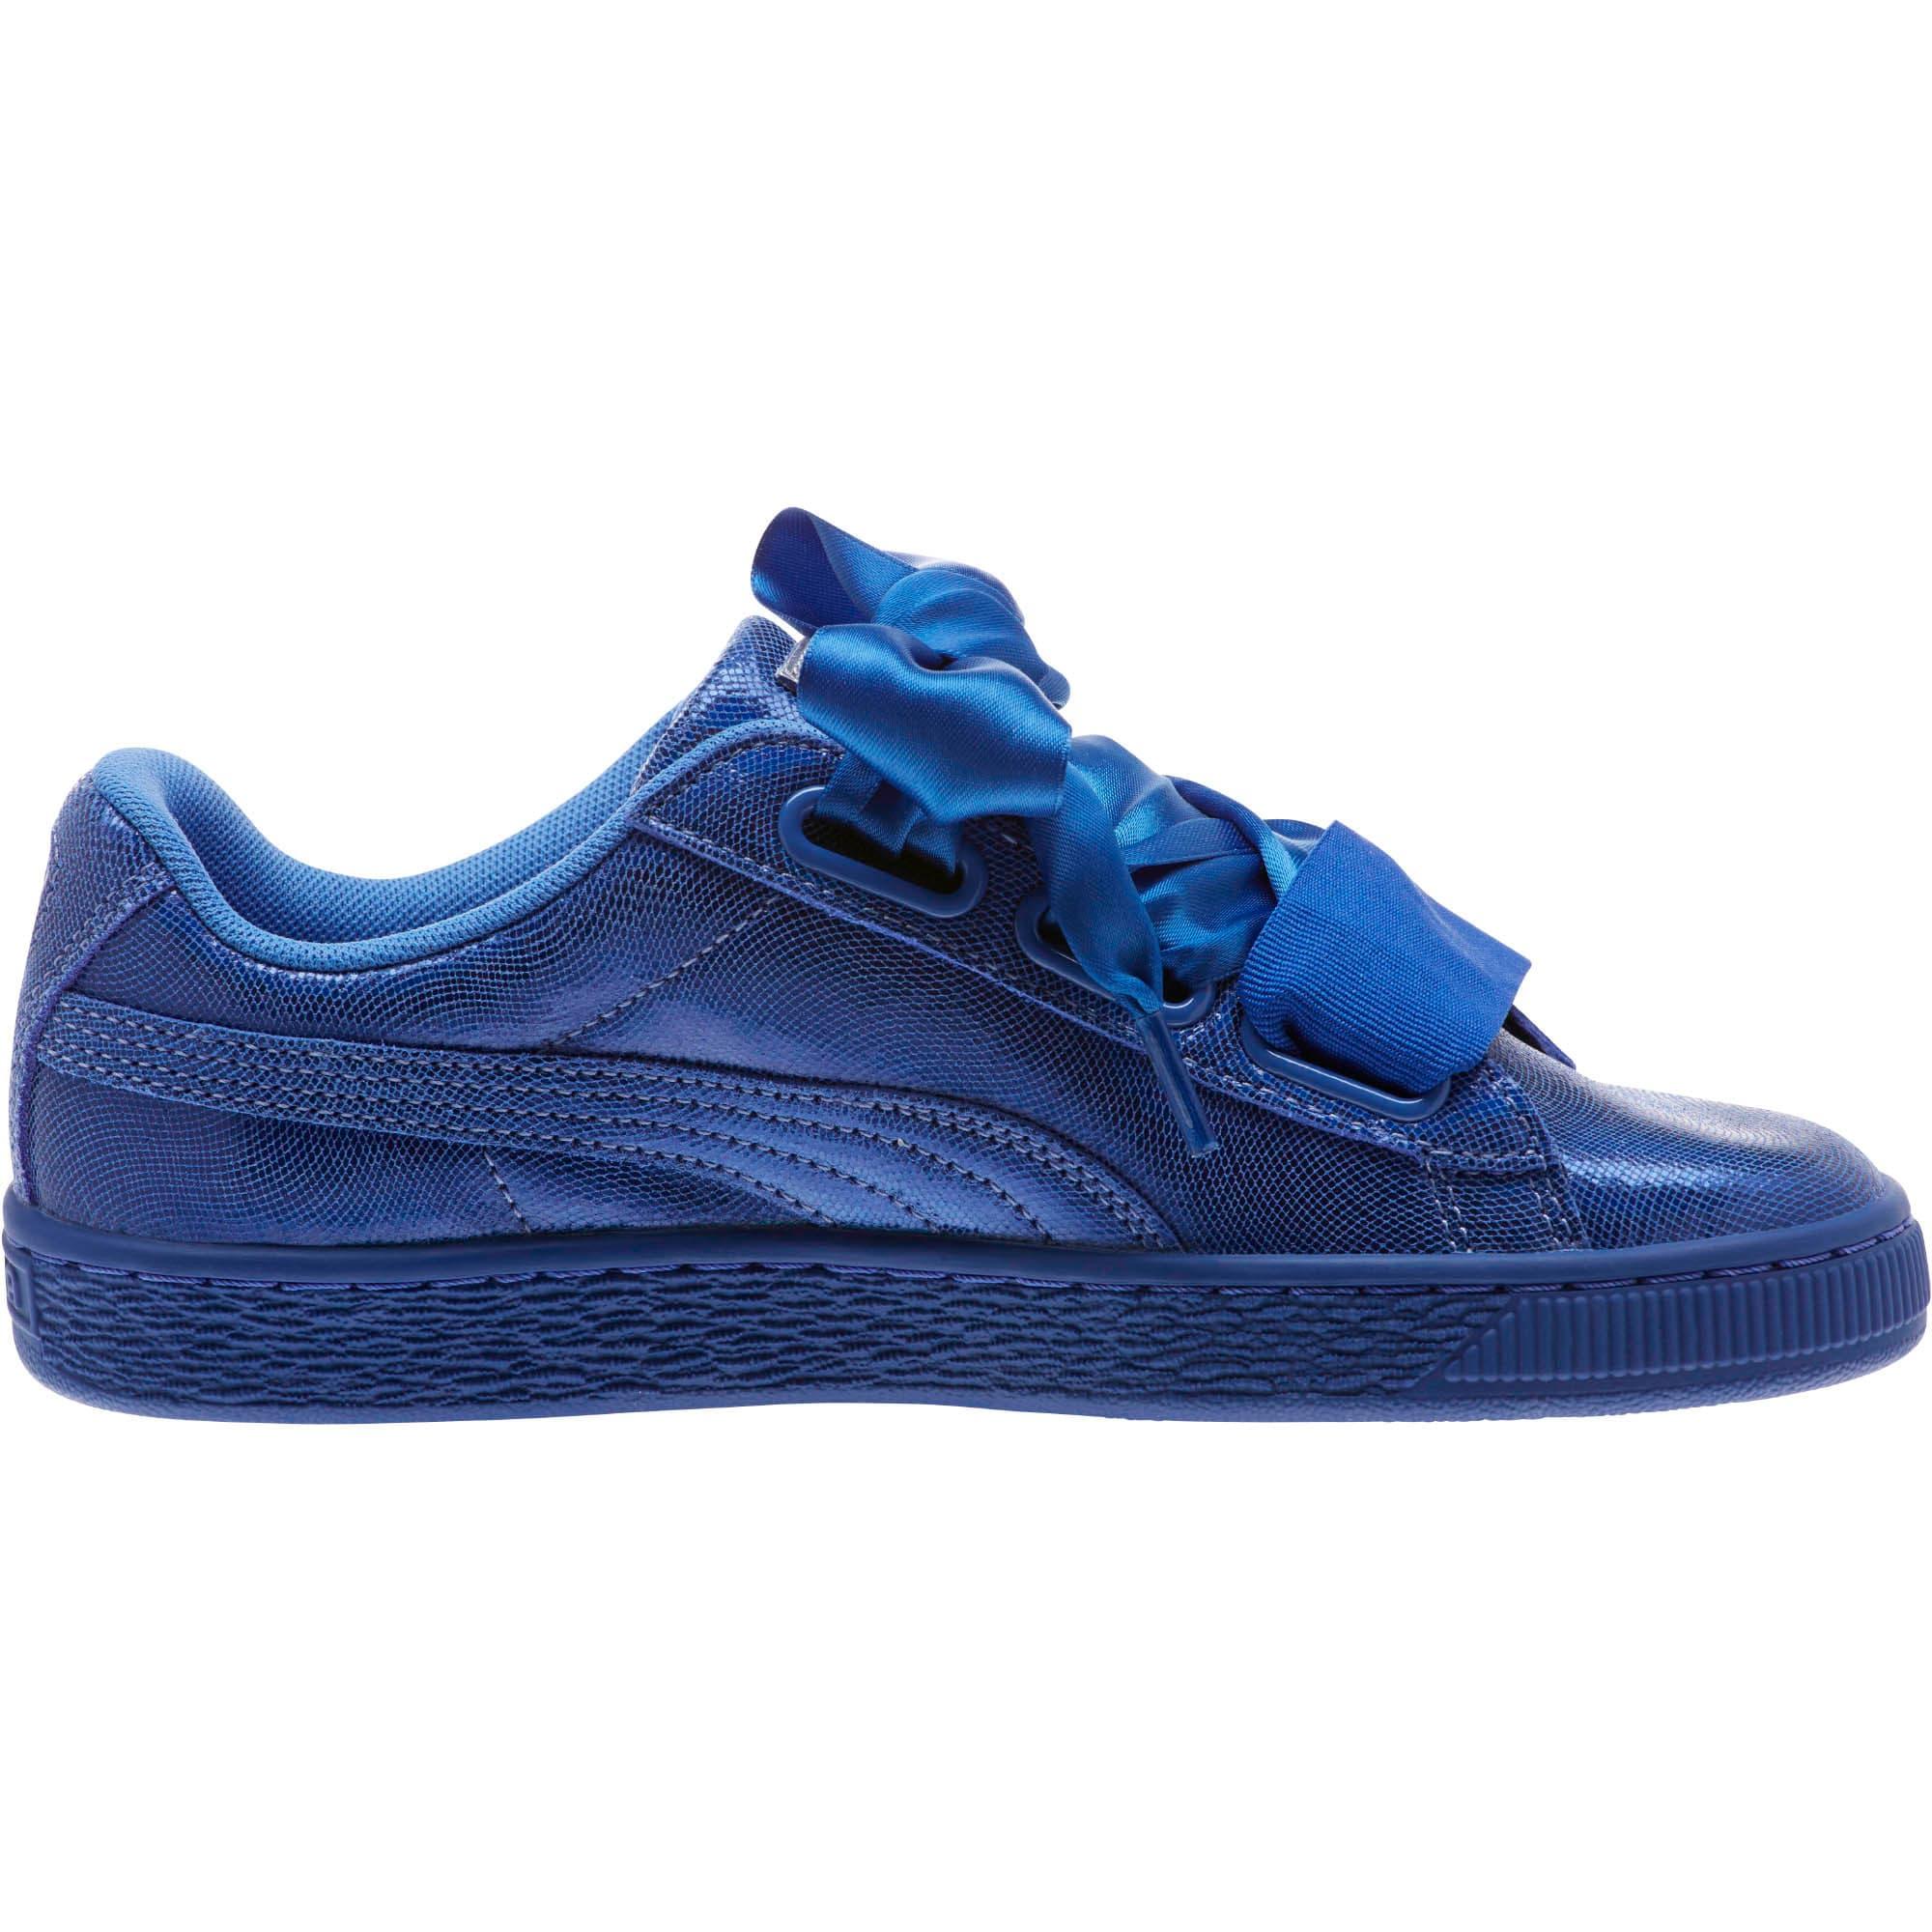 Thumbnail 3 of Basket Heart Opulence Women's Sneakers, Baja Blue-Baja Blue, medium